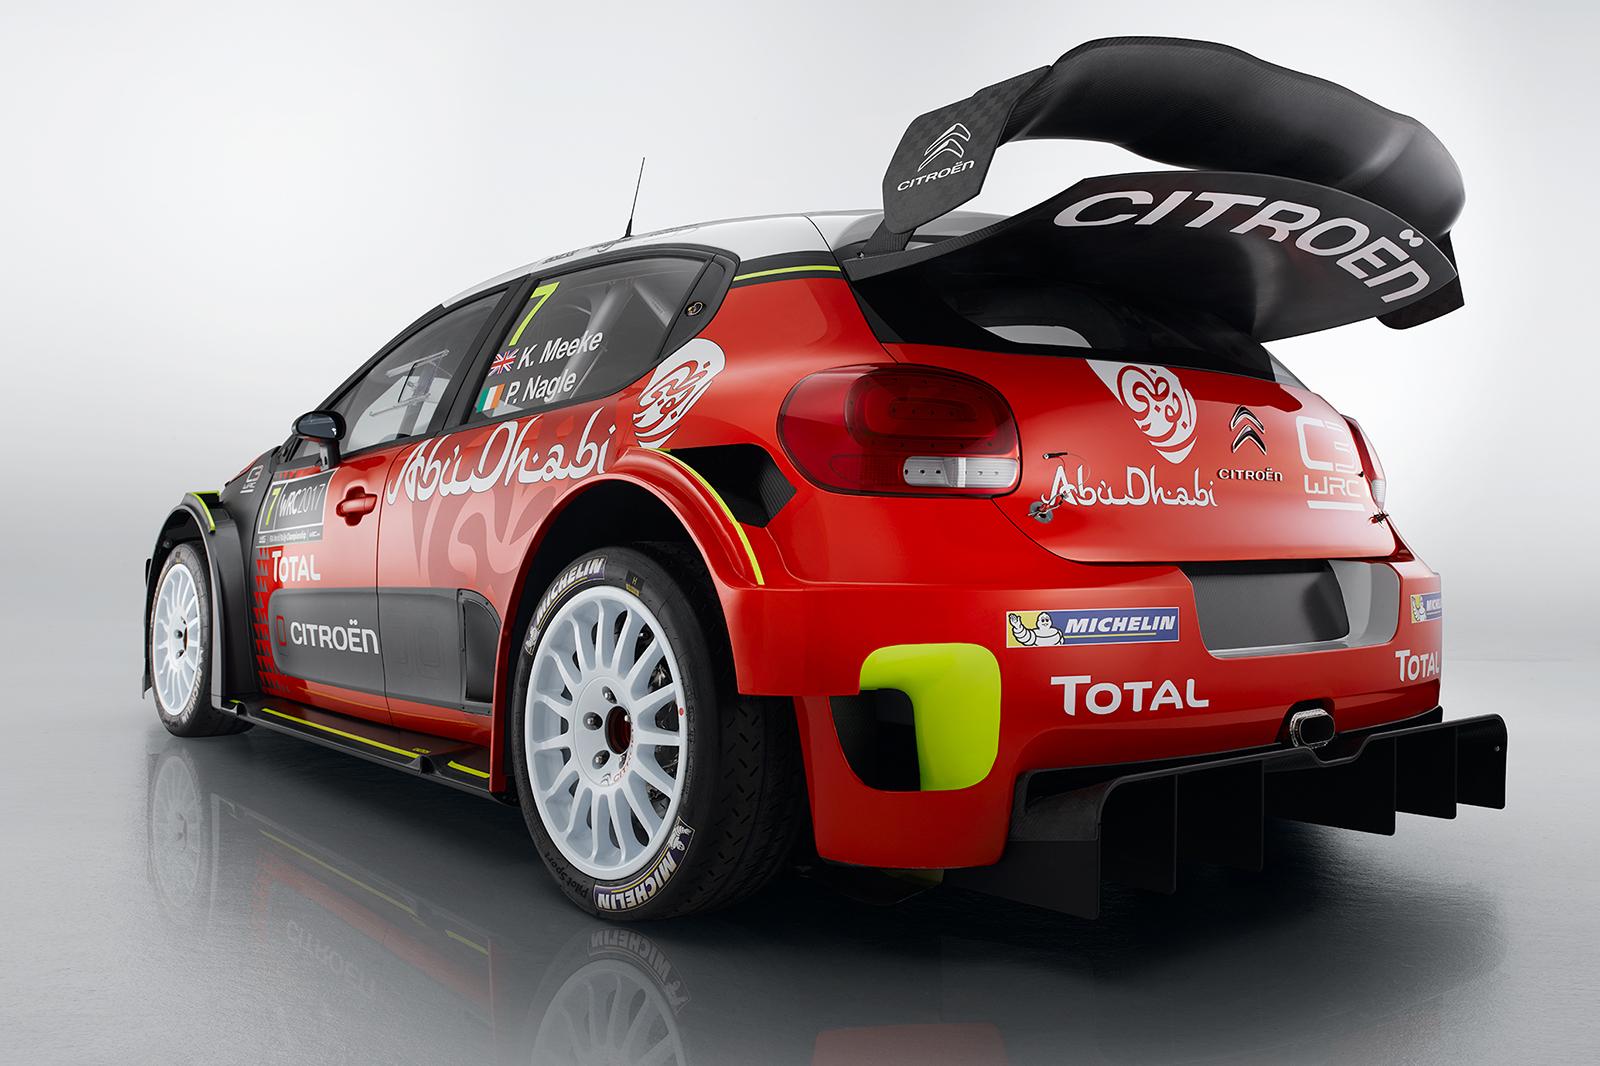 citroen c3 wrc revealed ahead of 2017 world rally championship autocar. Black Bedroom Furniture Sets. Home Design Ideas